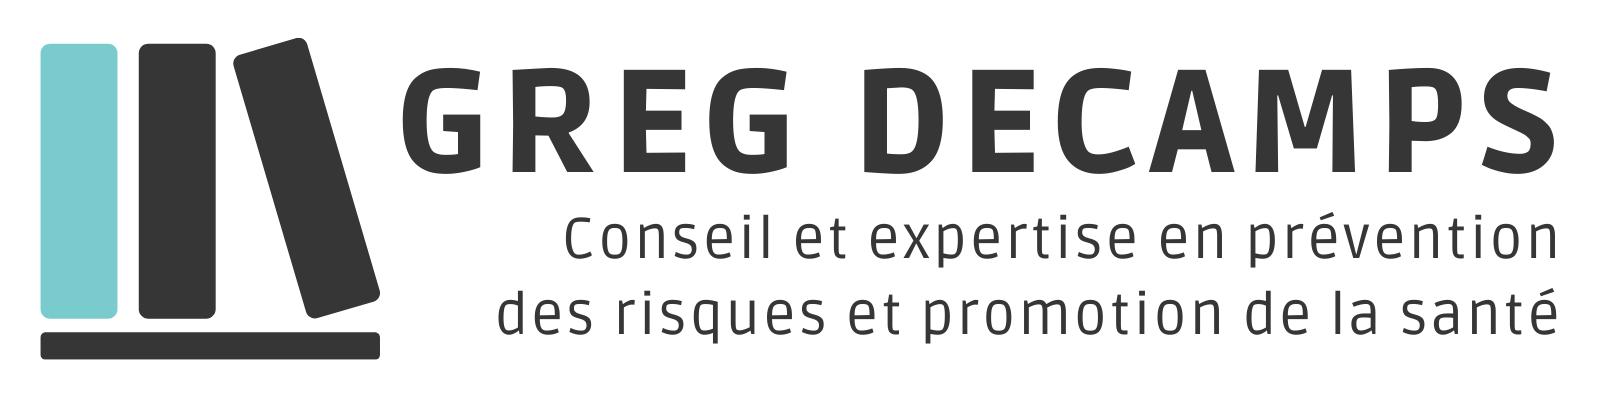 Greg Décamps